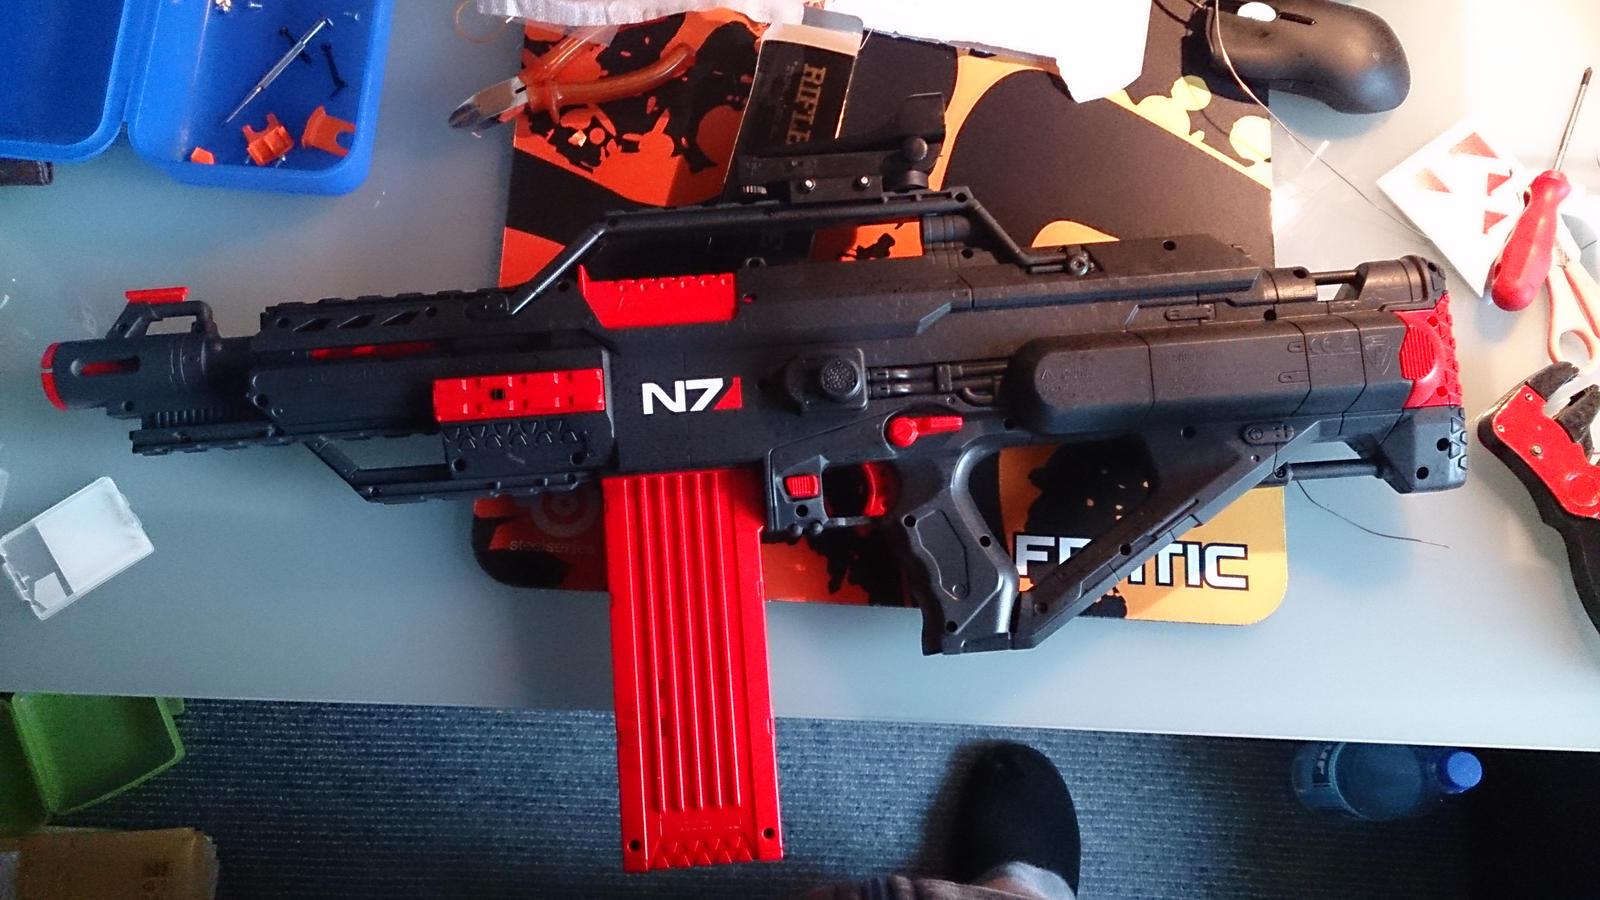 Mass effect n7 stampede nerf gun 2 by bbqjoe on deviantart - Nerf wallpaper ...